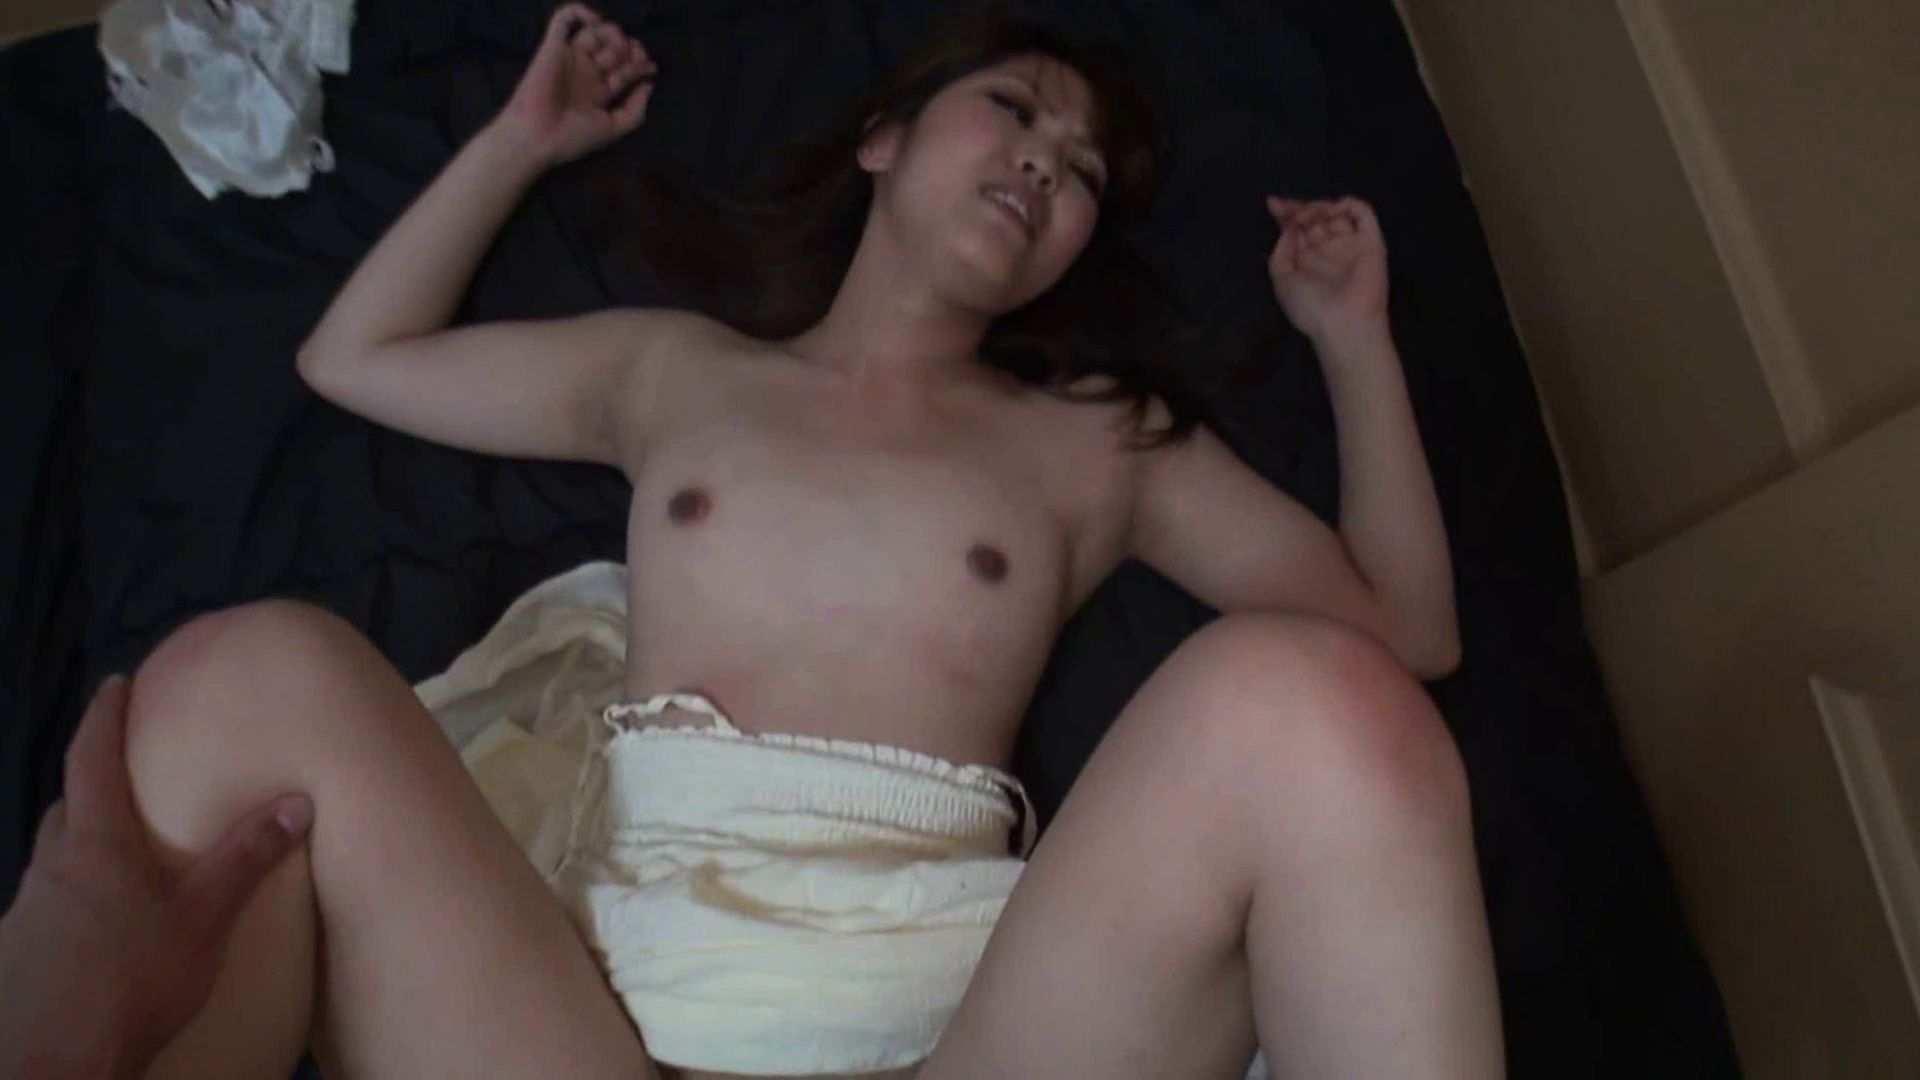 S級厳選美女ビッチガールVol.50 後編 セックス  90枚 57